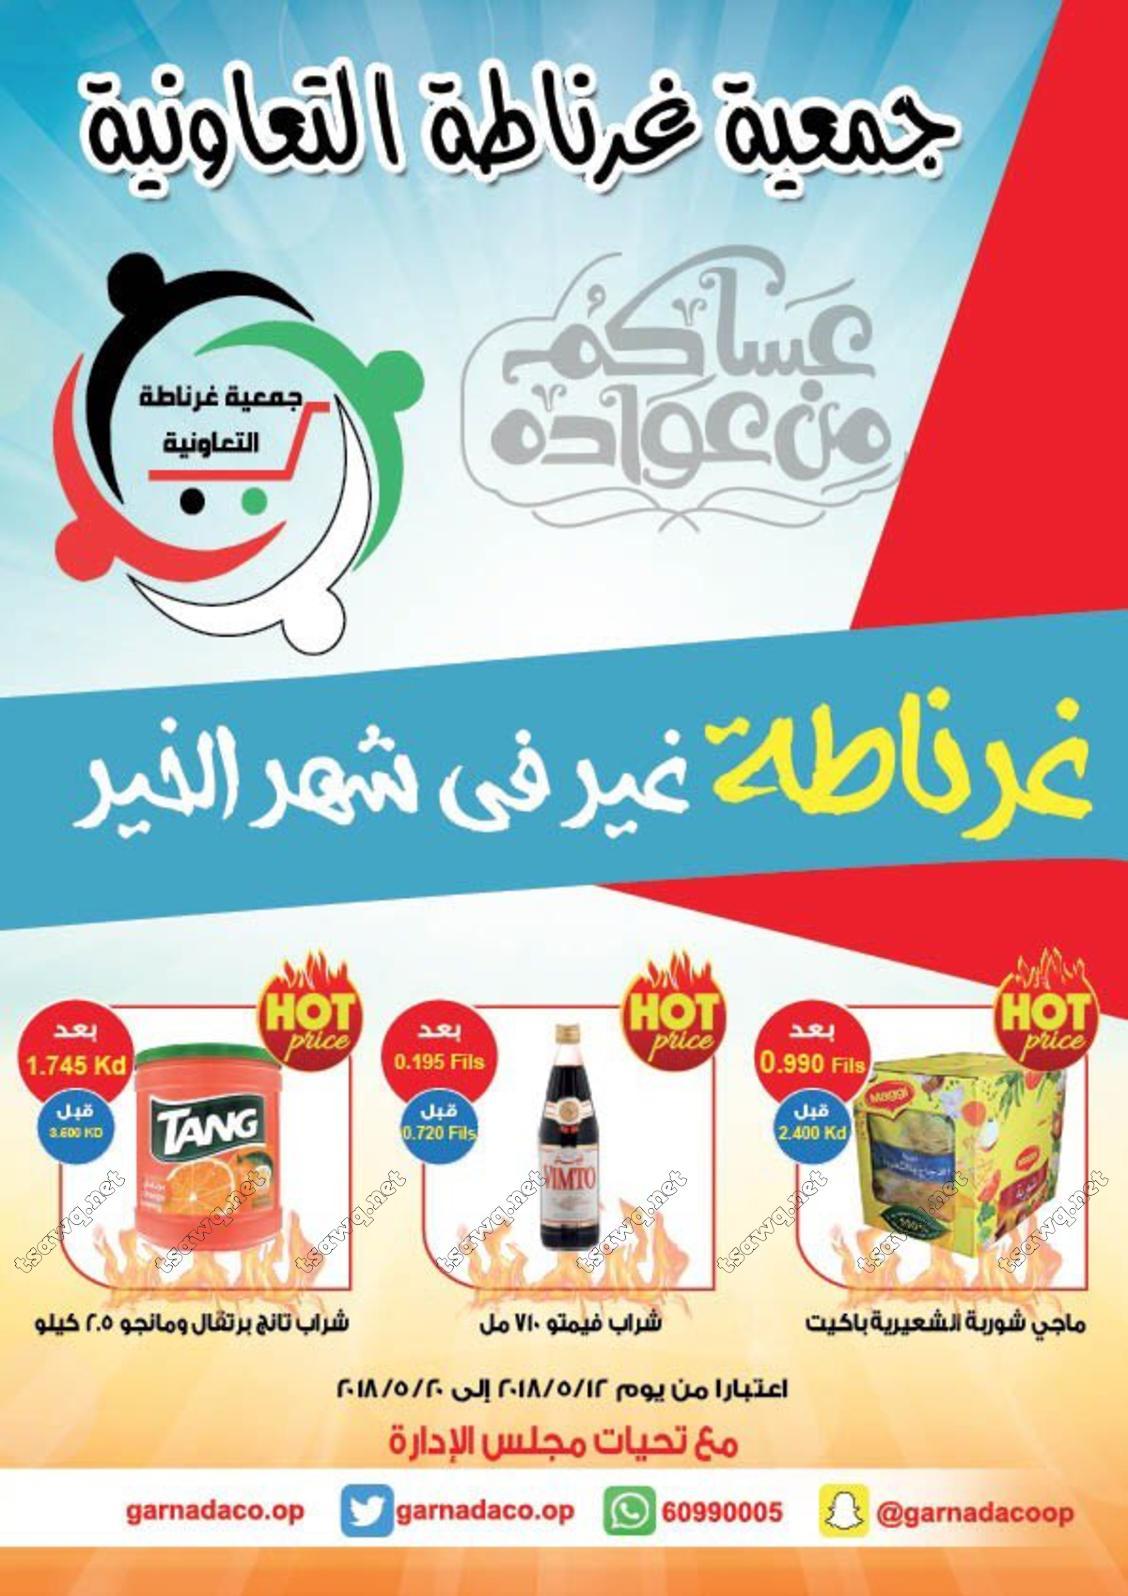 2e8d8b873 عروض جمعية غرناطة التعاونية الكويت من 12 حتى 20 مايو 2018   تسوق نت